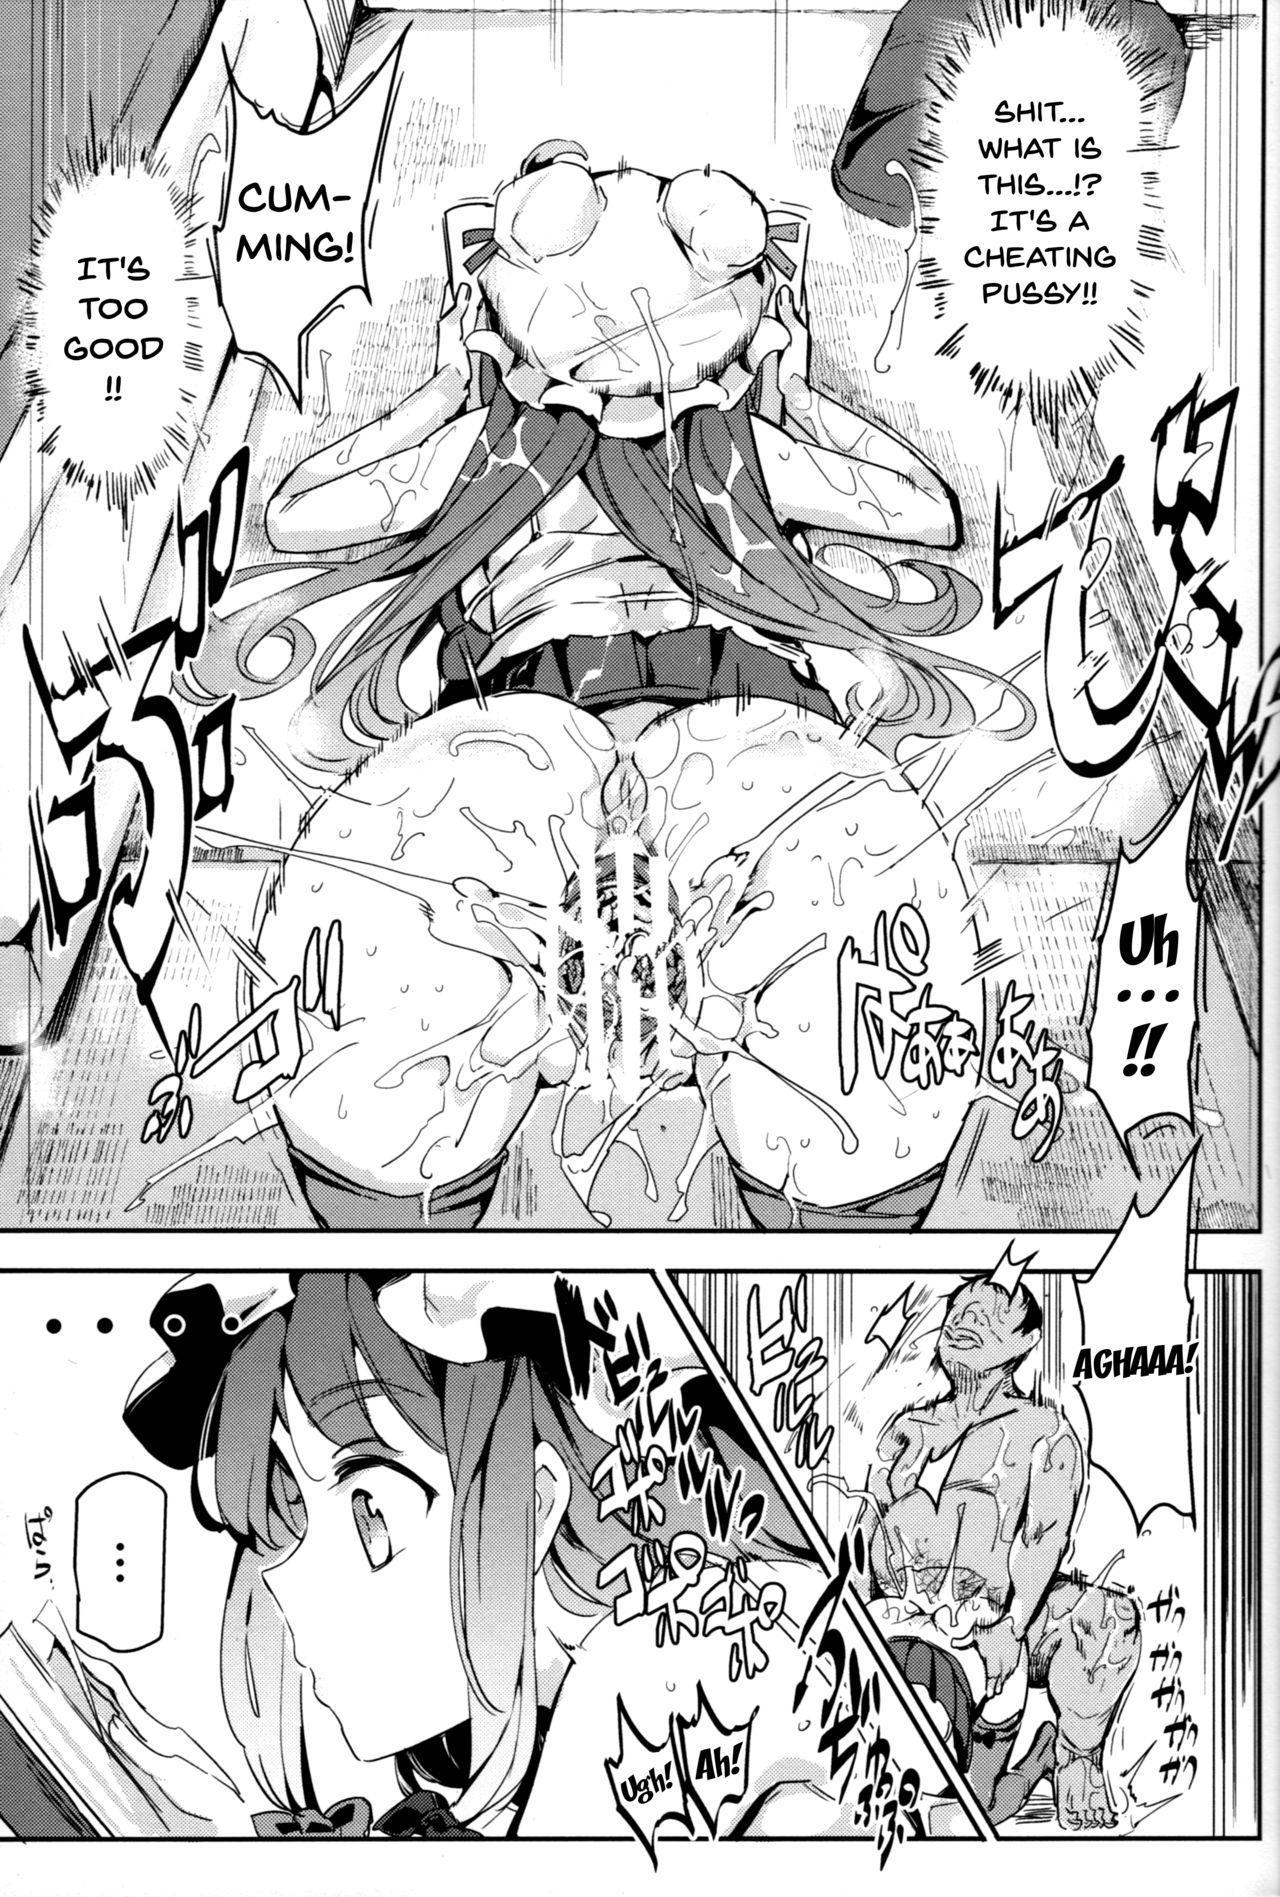 (Shuuki Reitaisai 4) [Nyuu Koubou (Nyuu)] Totsuzen Gekiiki Patchouli-sama | Suddenly Patchouli-sama Violently Came (Touhou Project) [English] [Doujins.com] 7